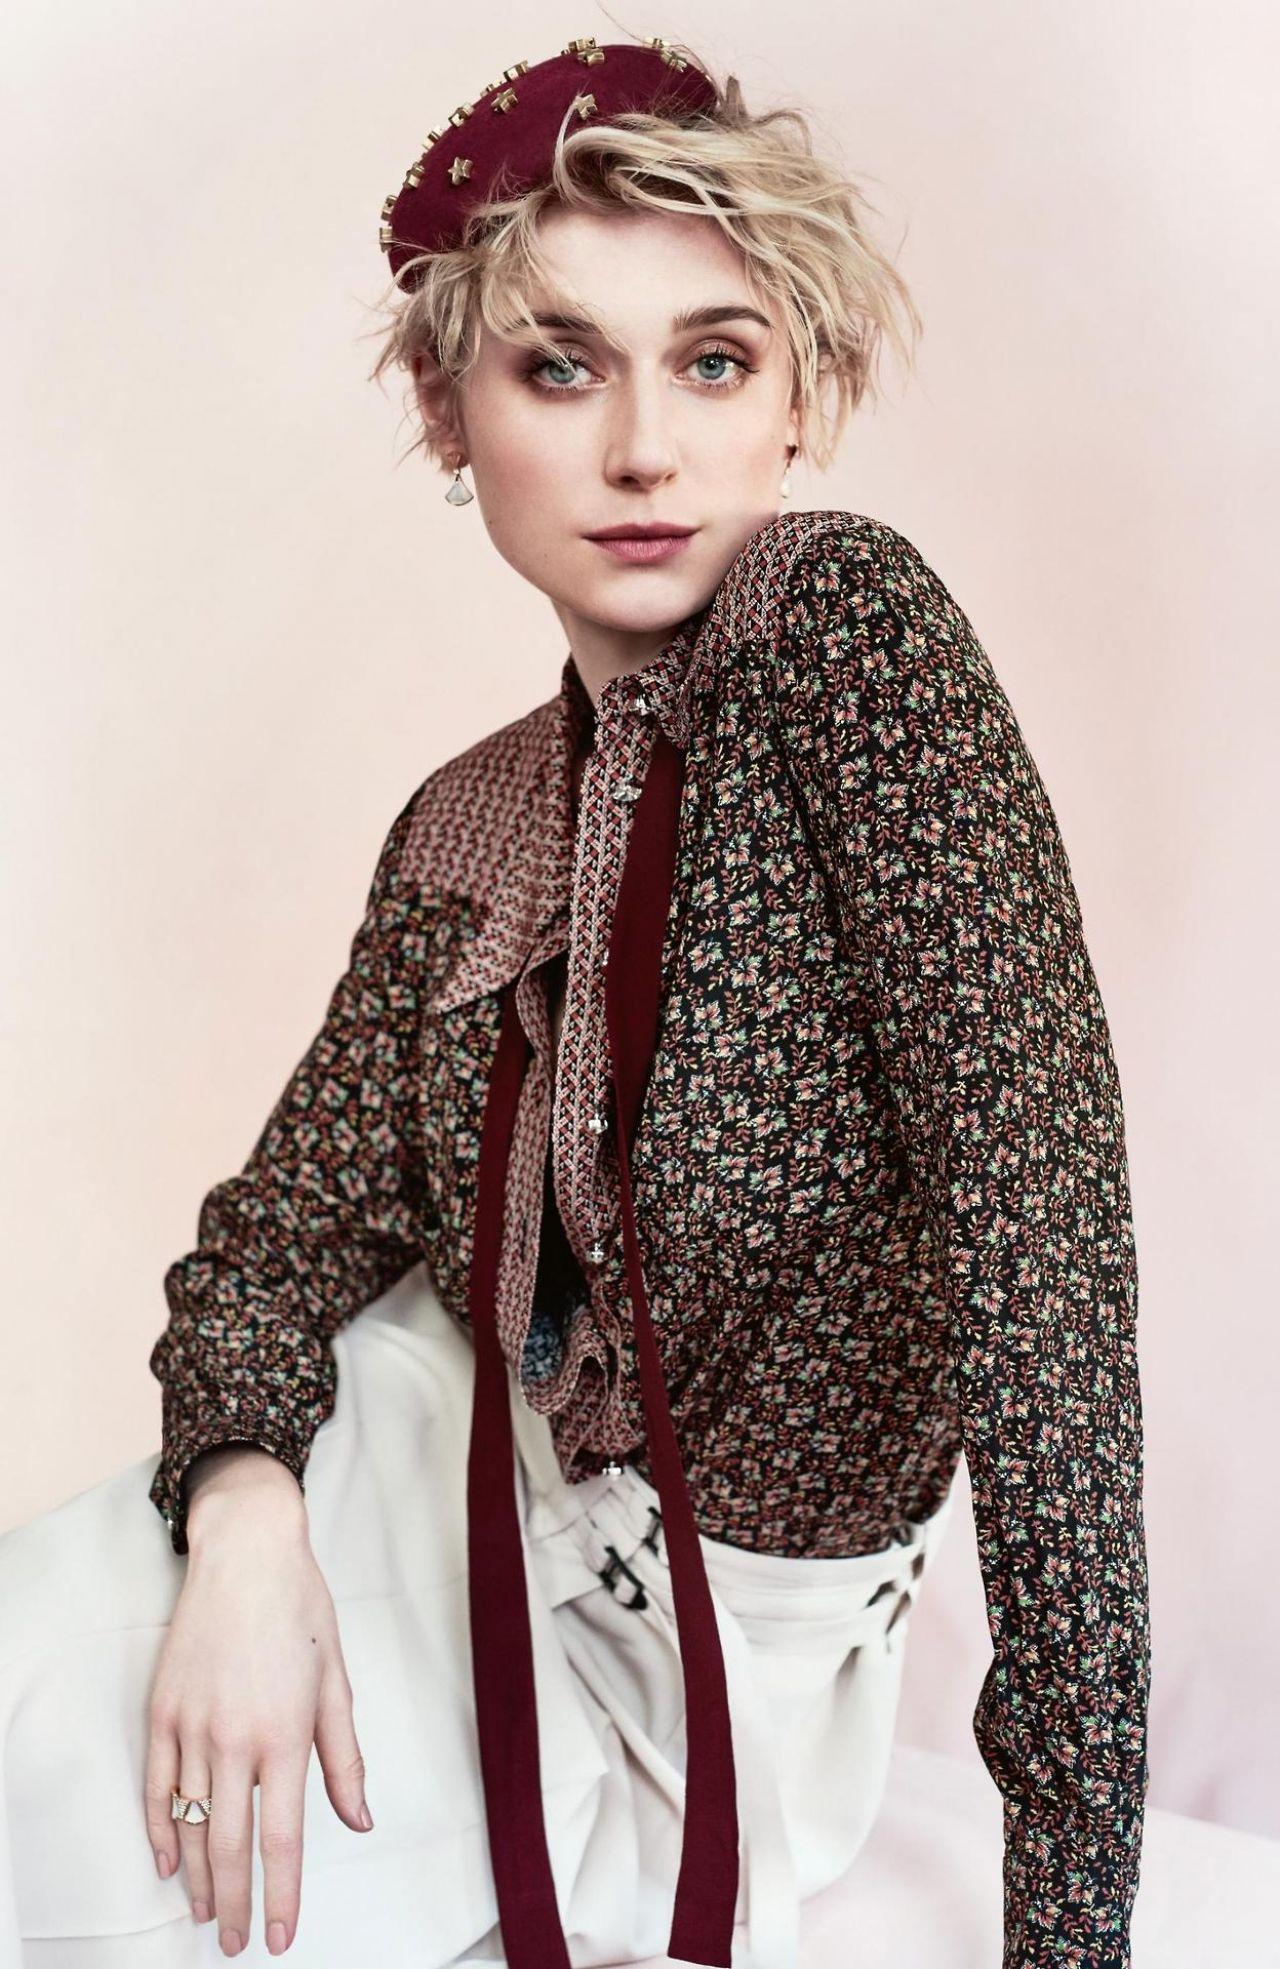 Photoshoot For Vogue Magazine November 2015: Photoshoot For Stellar Magazine March 2017